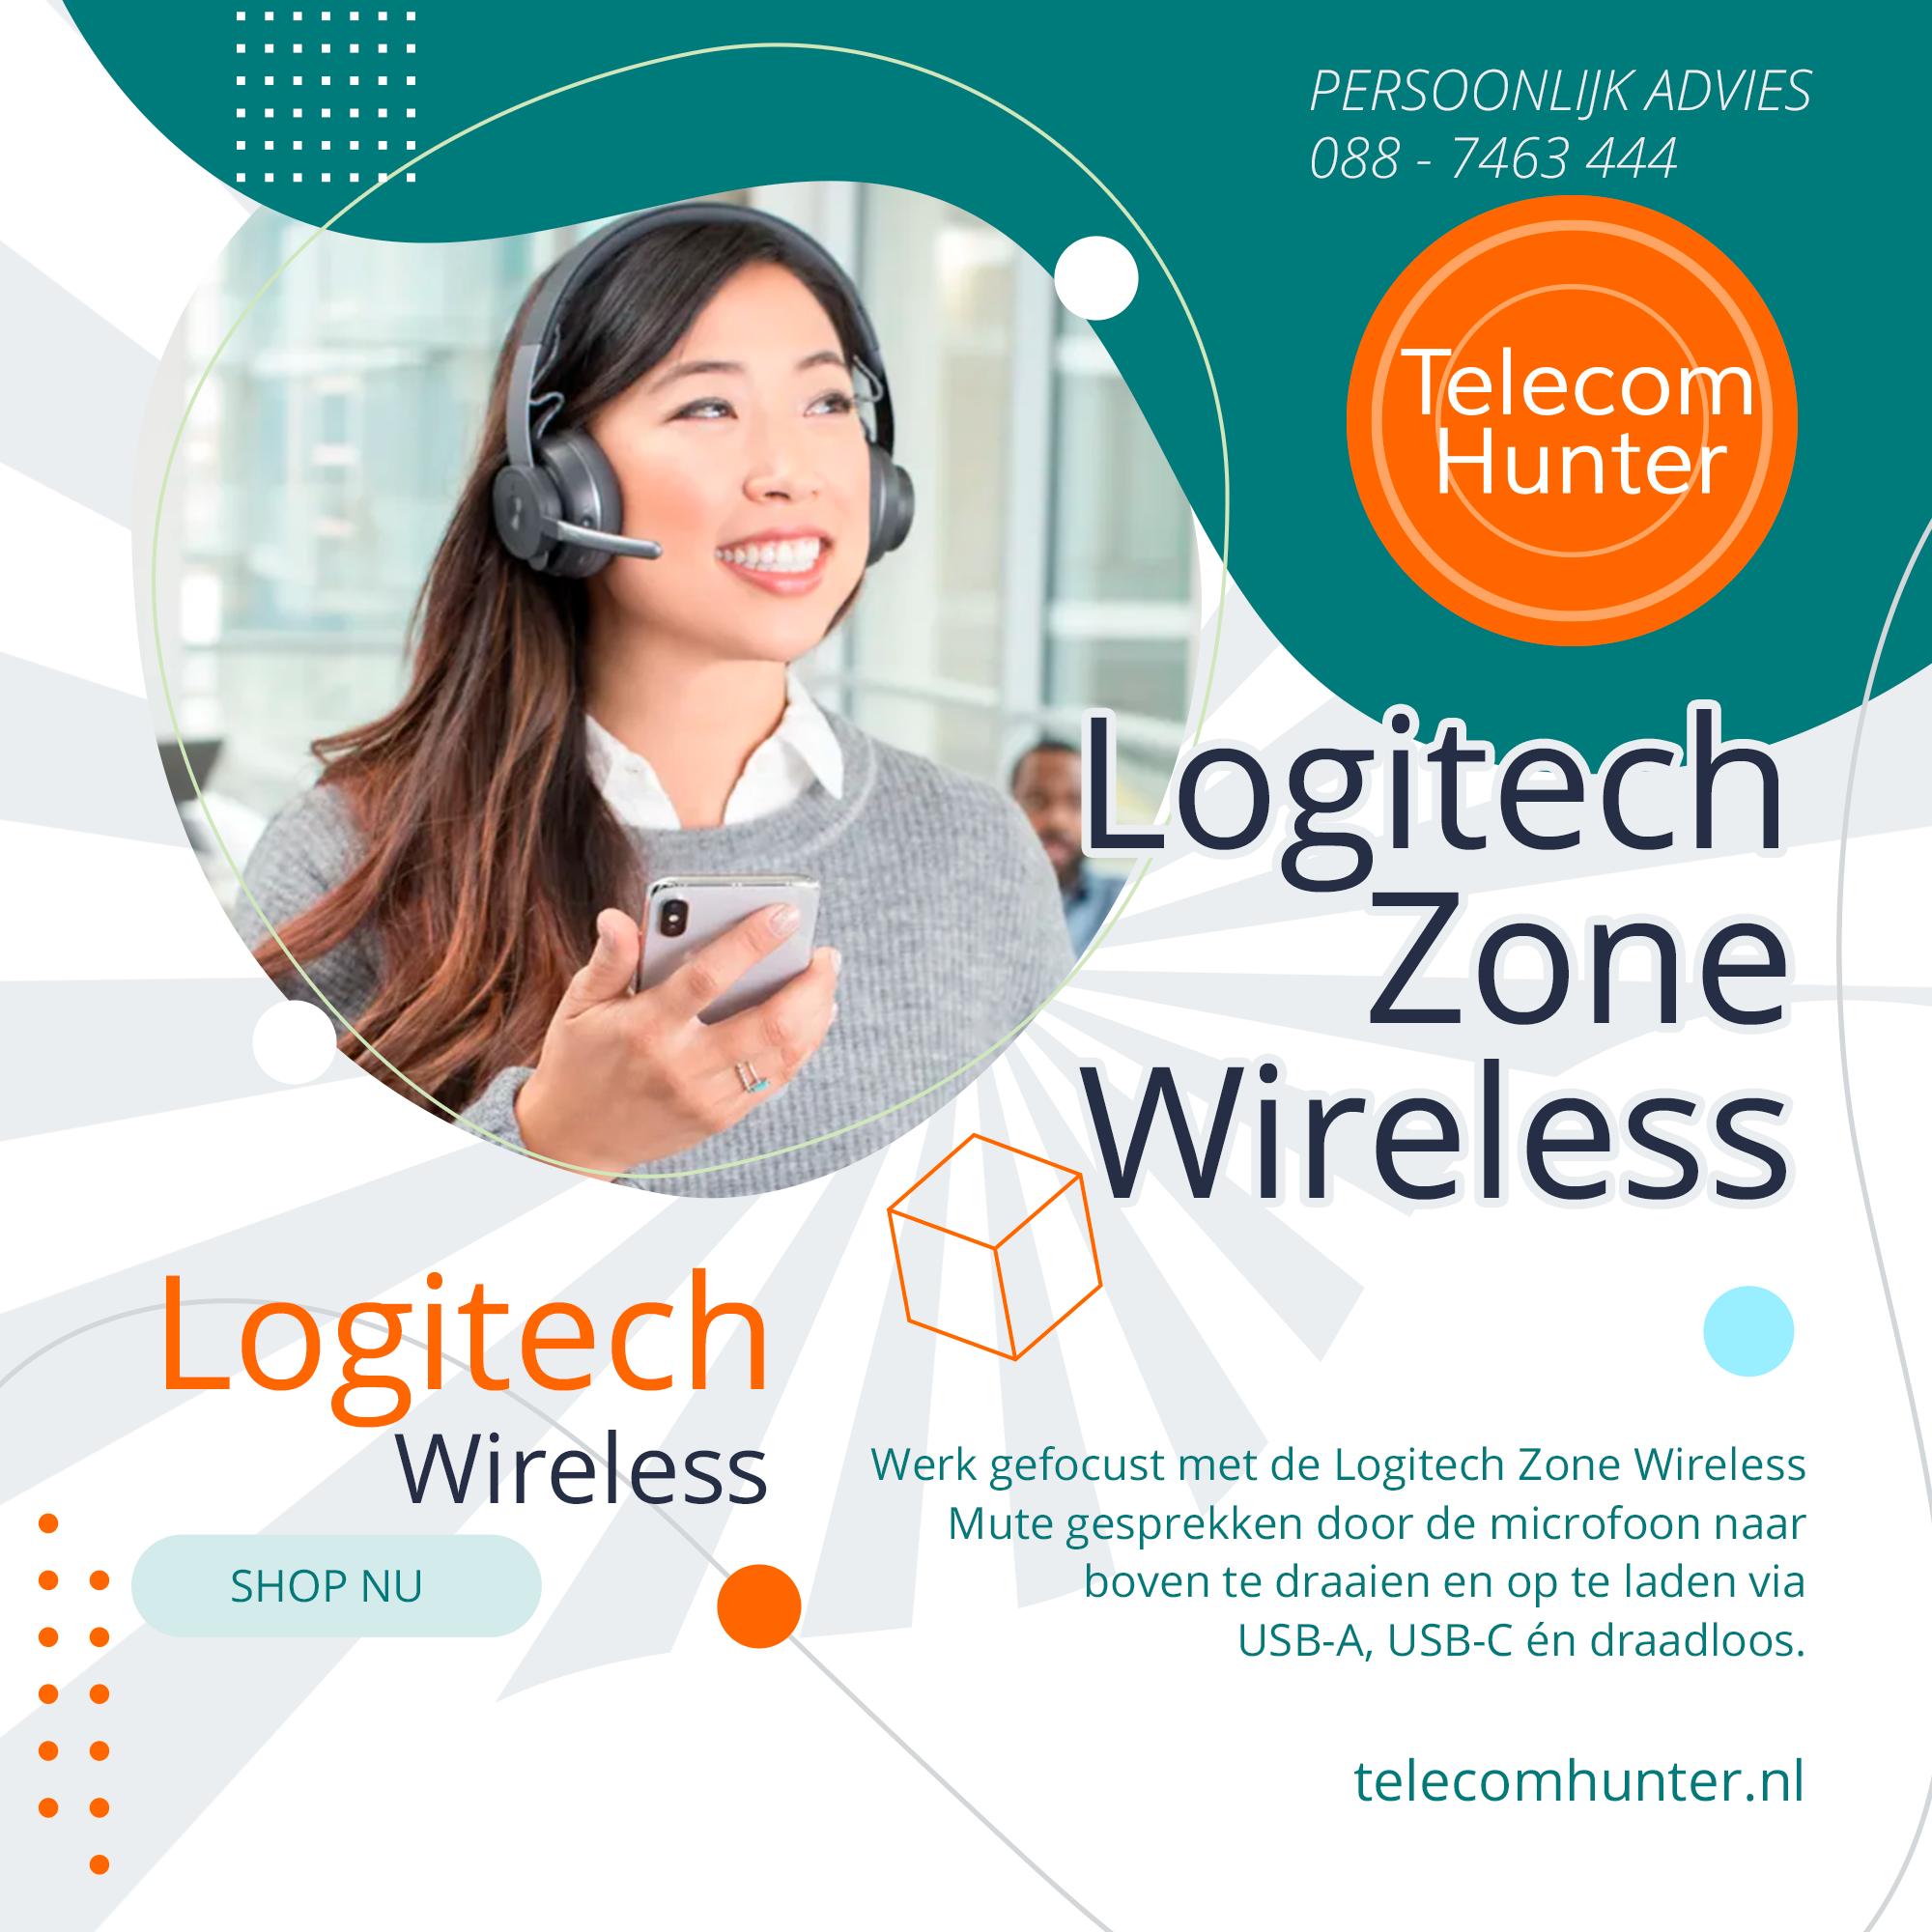 Logitech Zone Wireless